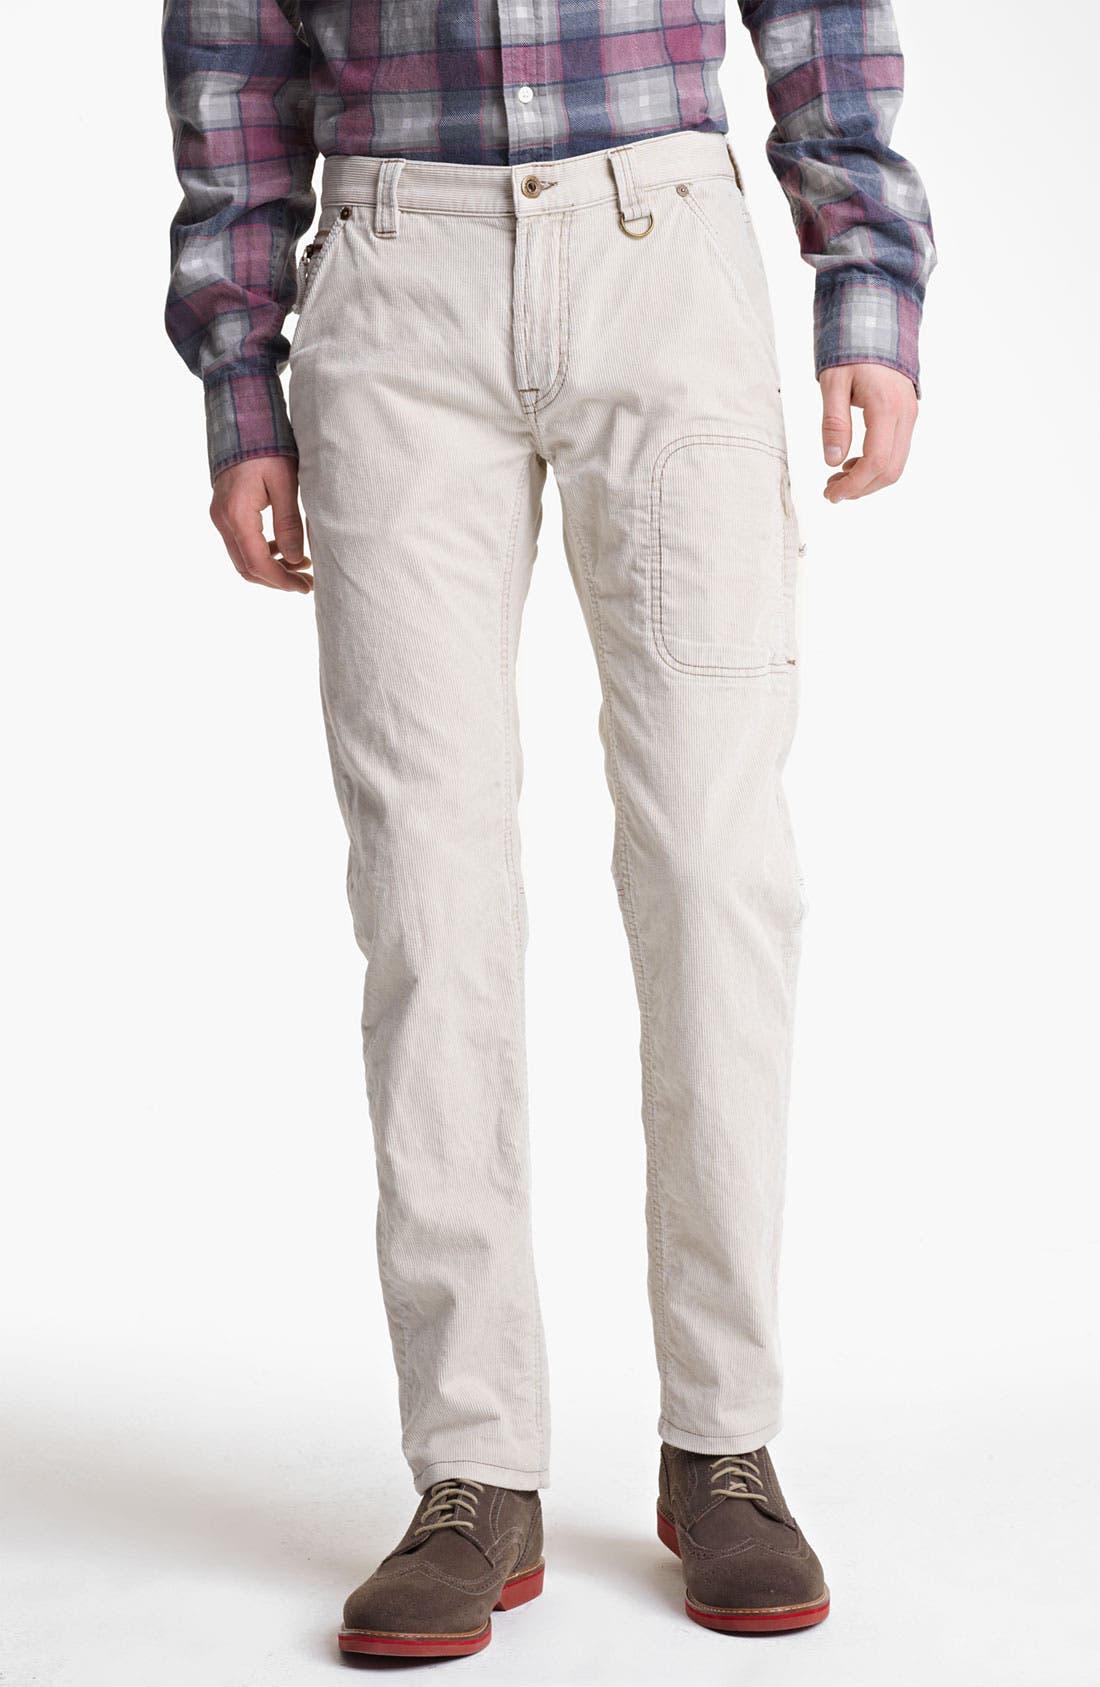 Alternate Image 1 Selected - Gant by Michael Bastian 'Explorer' Slim Leg Corduroy Pants